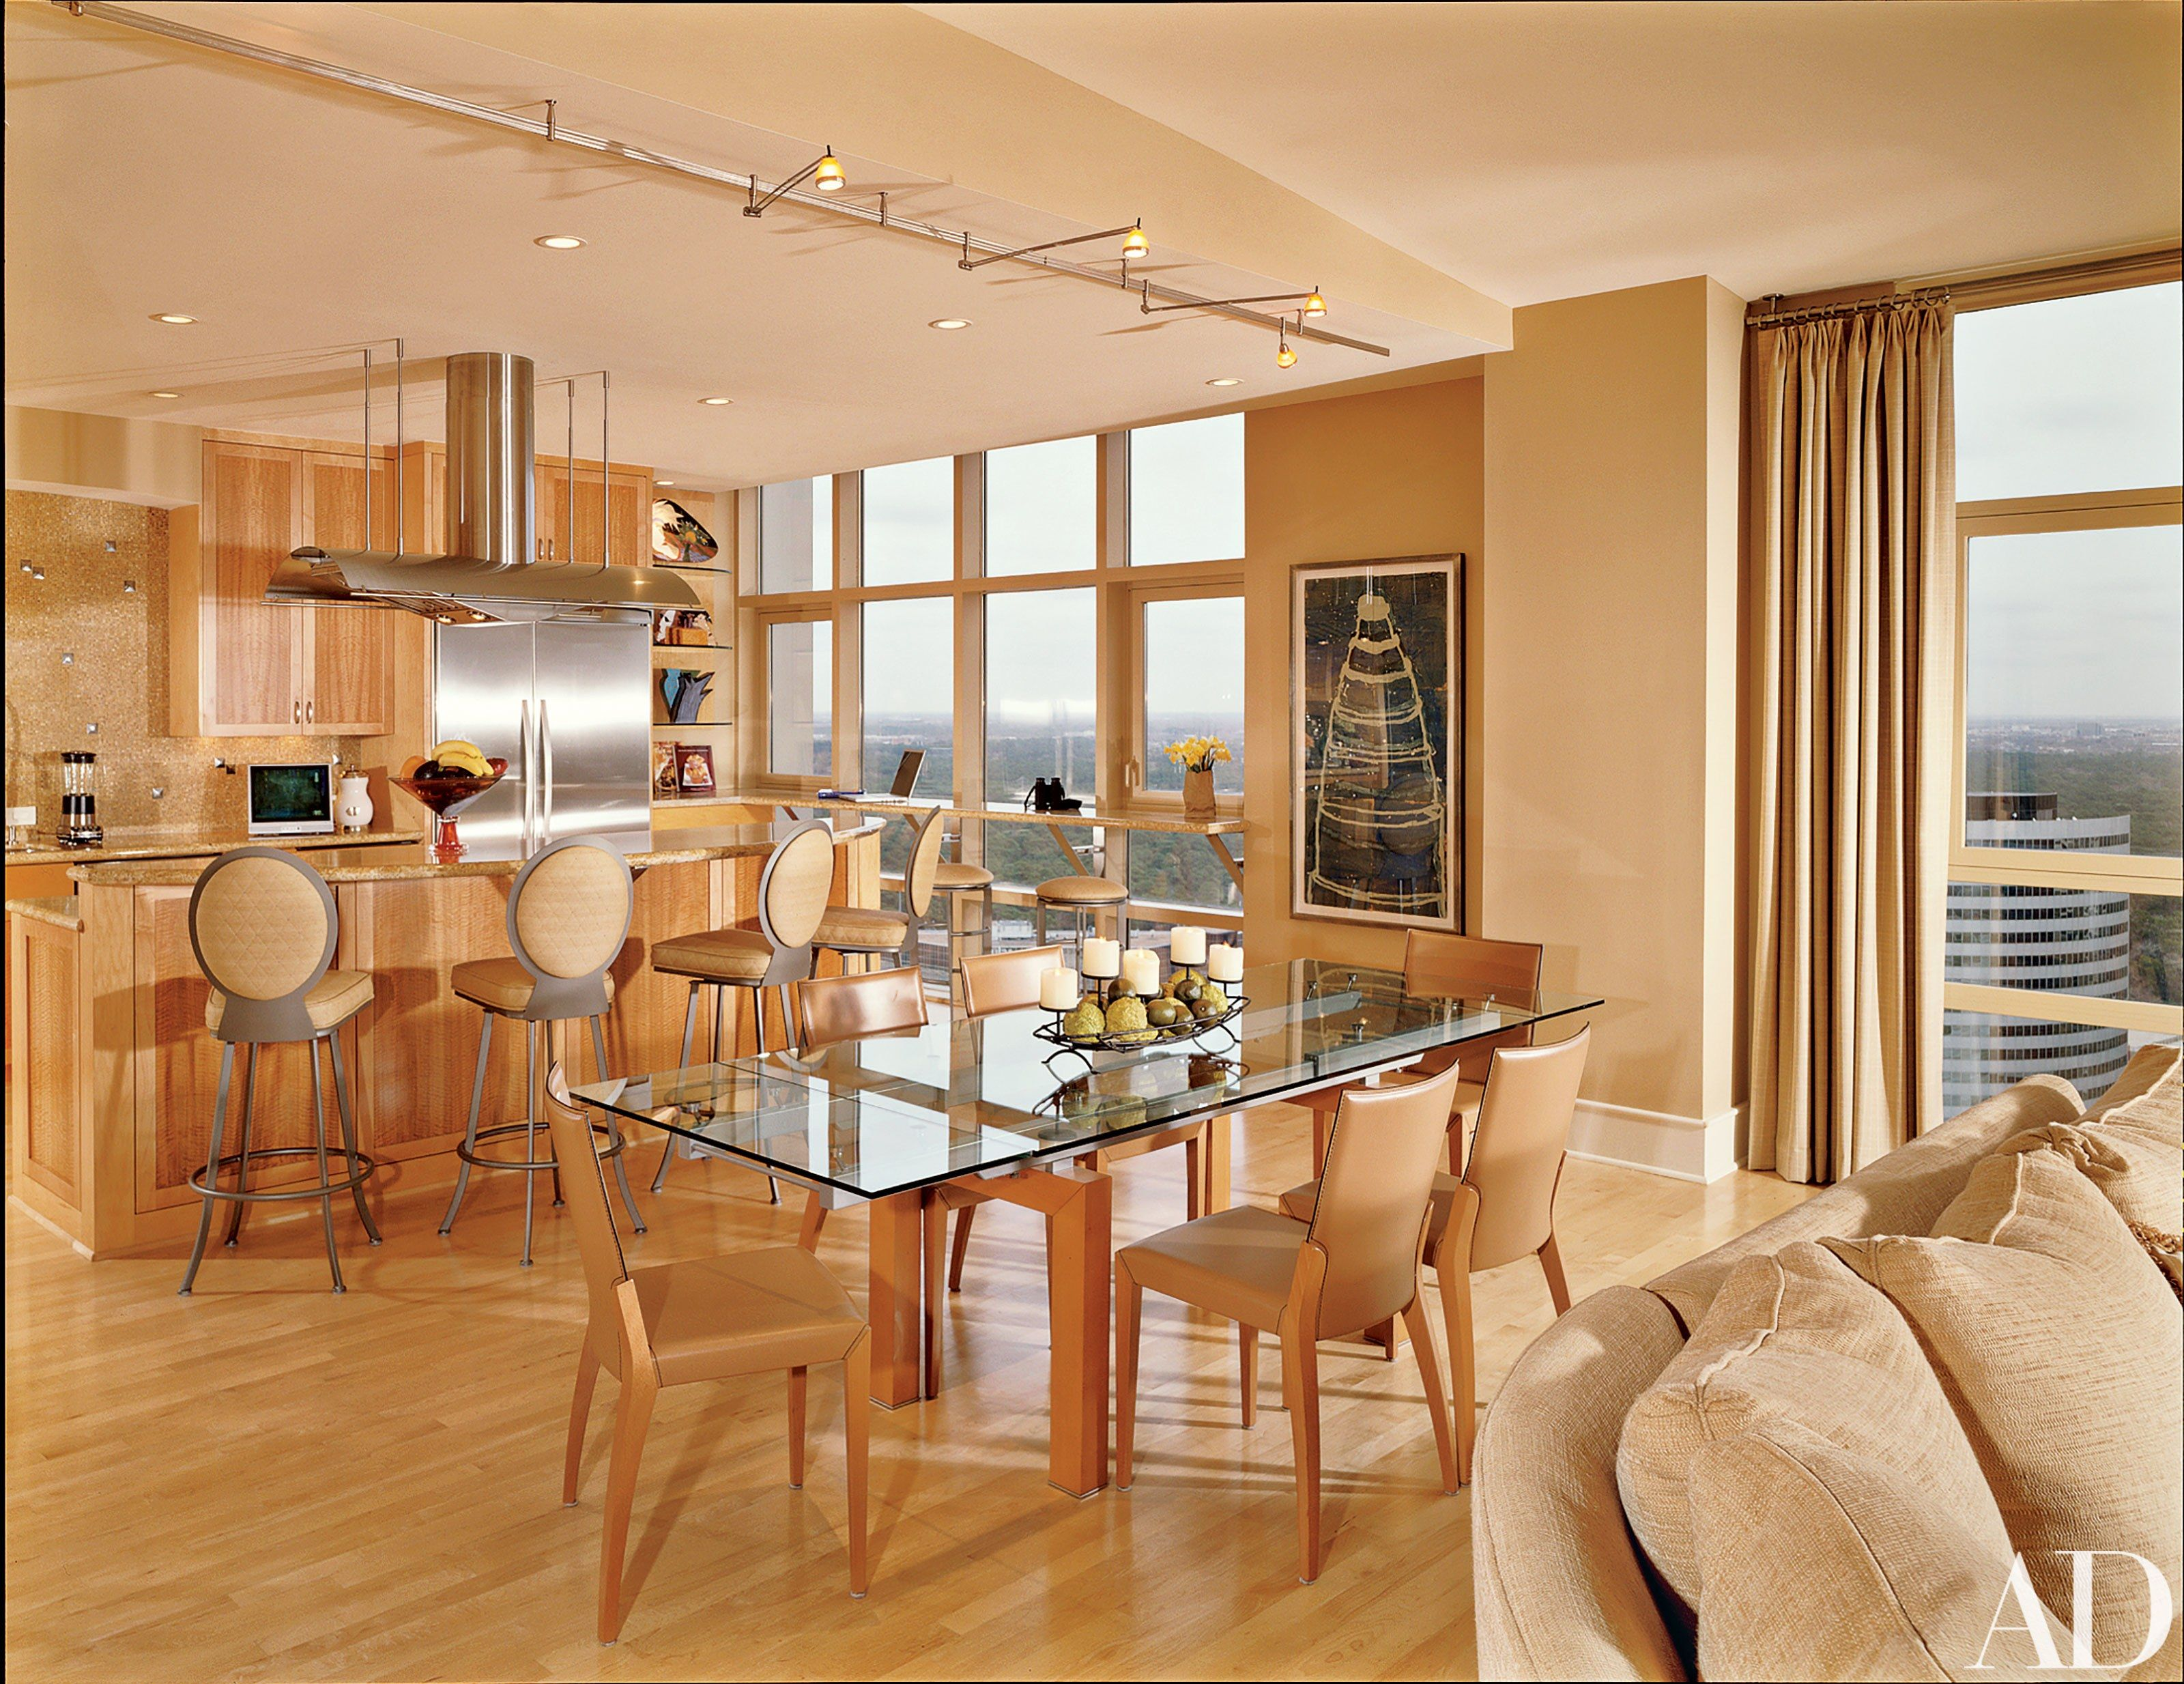 Stunning Extravagantes Penthouse Design Pictures - Ridgewayng.com ...